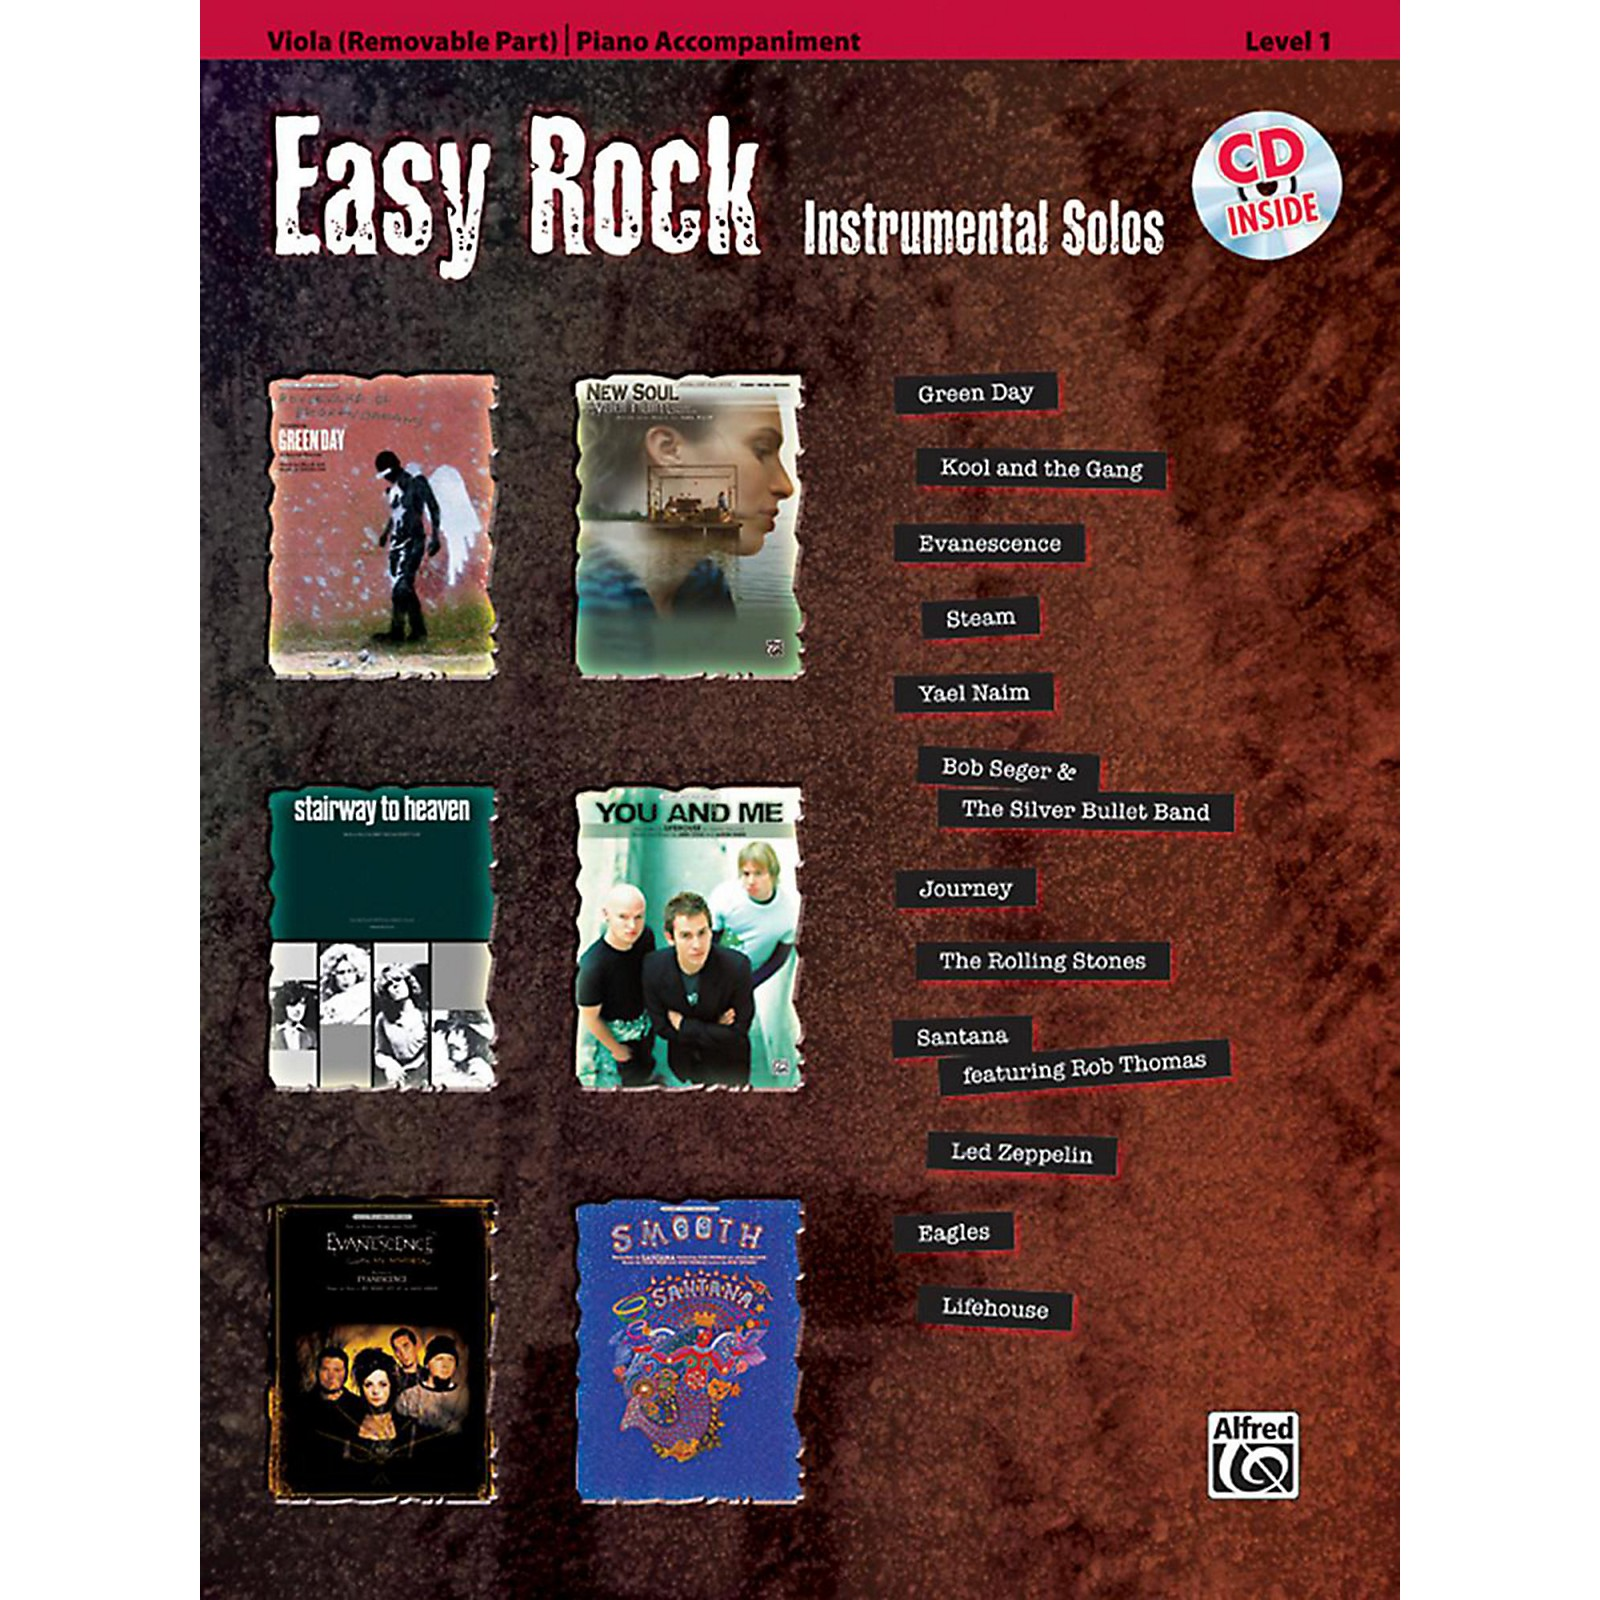 Alfred Easy Rock Instrumental Solos Level 1 for Strings Viola Book & CD